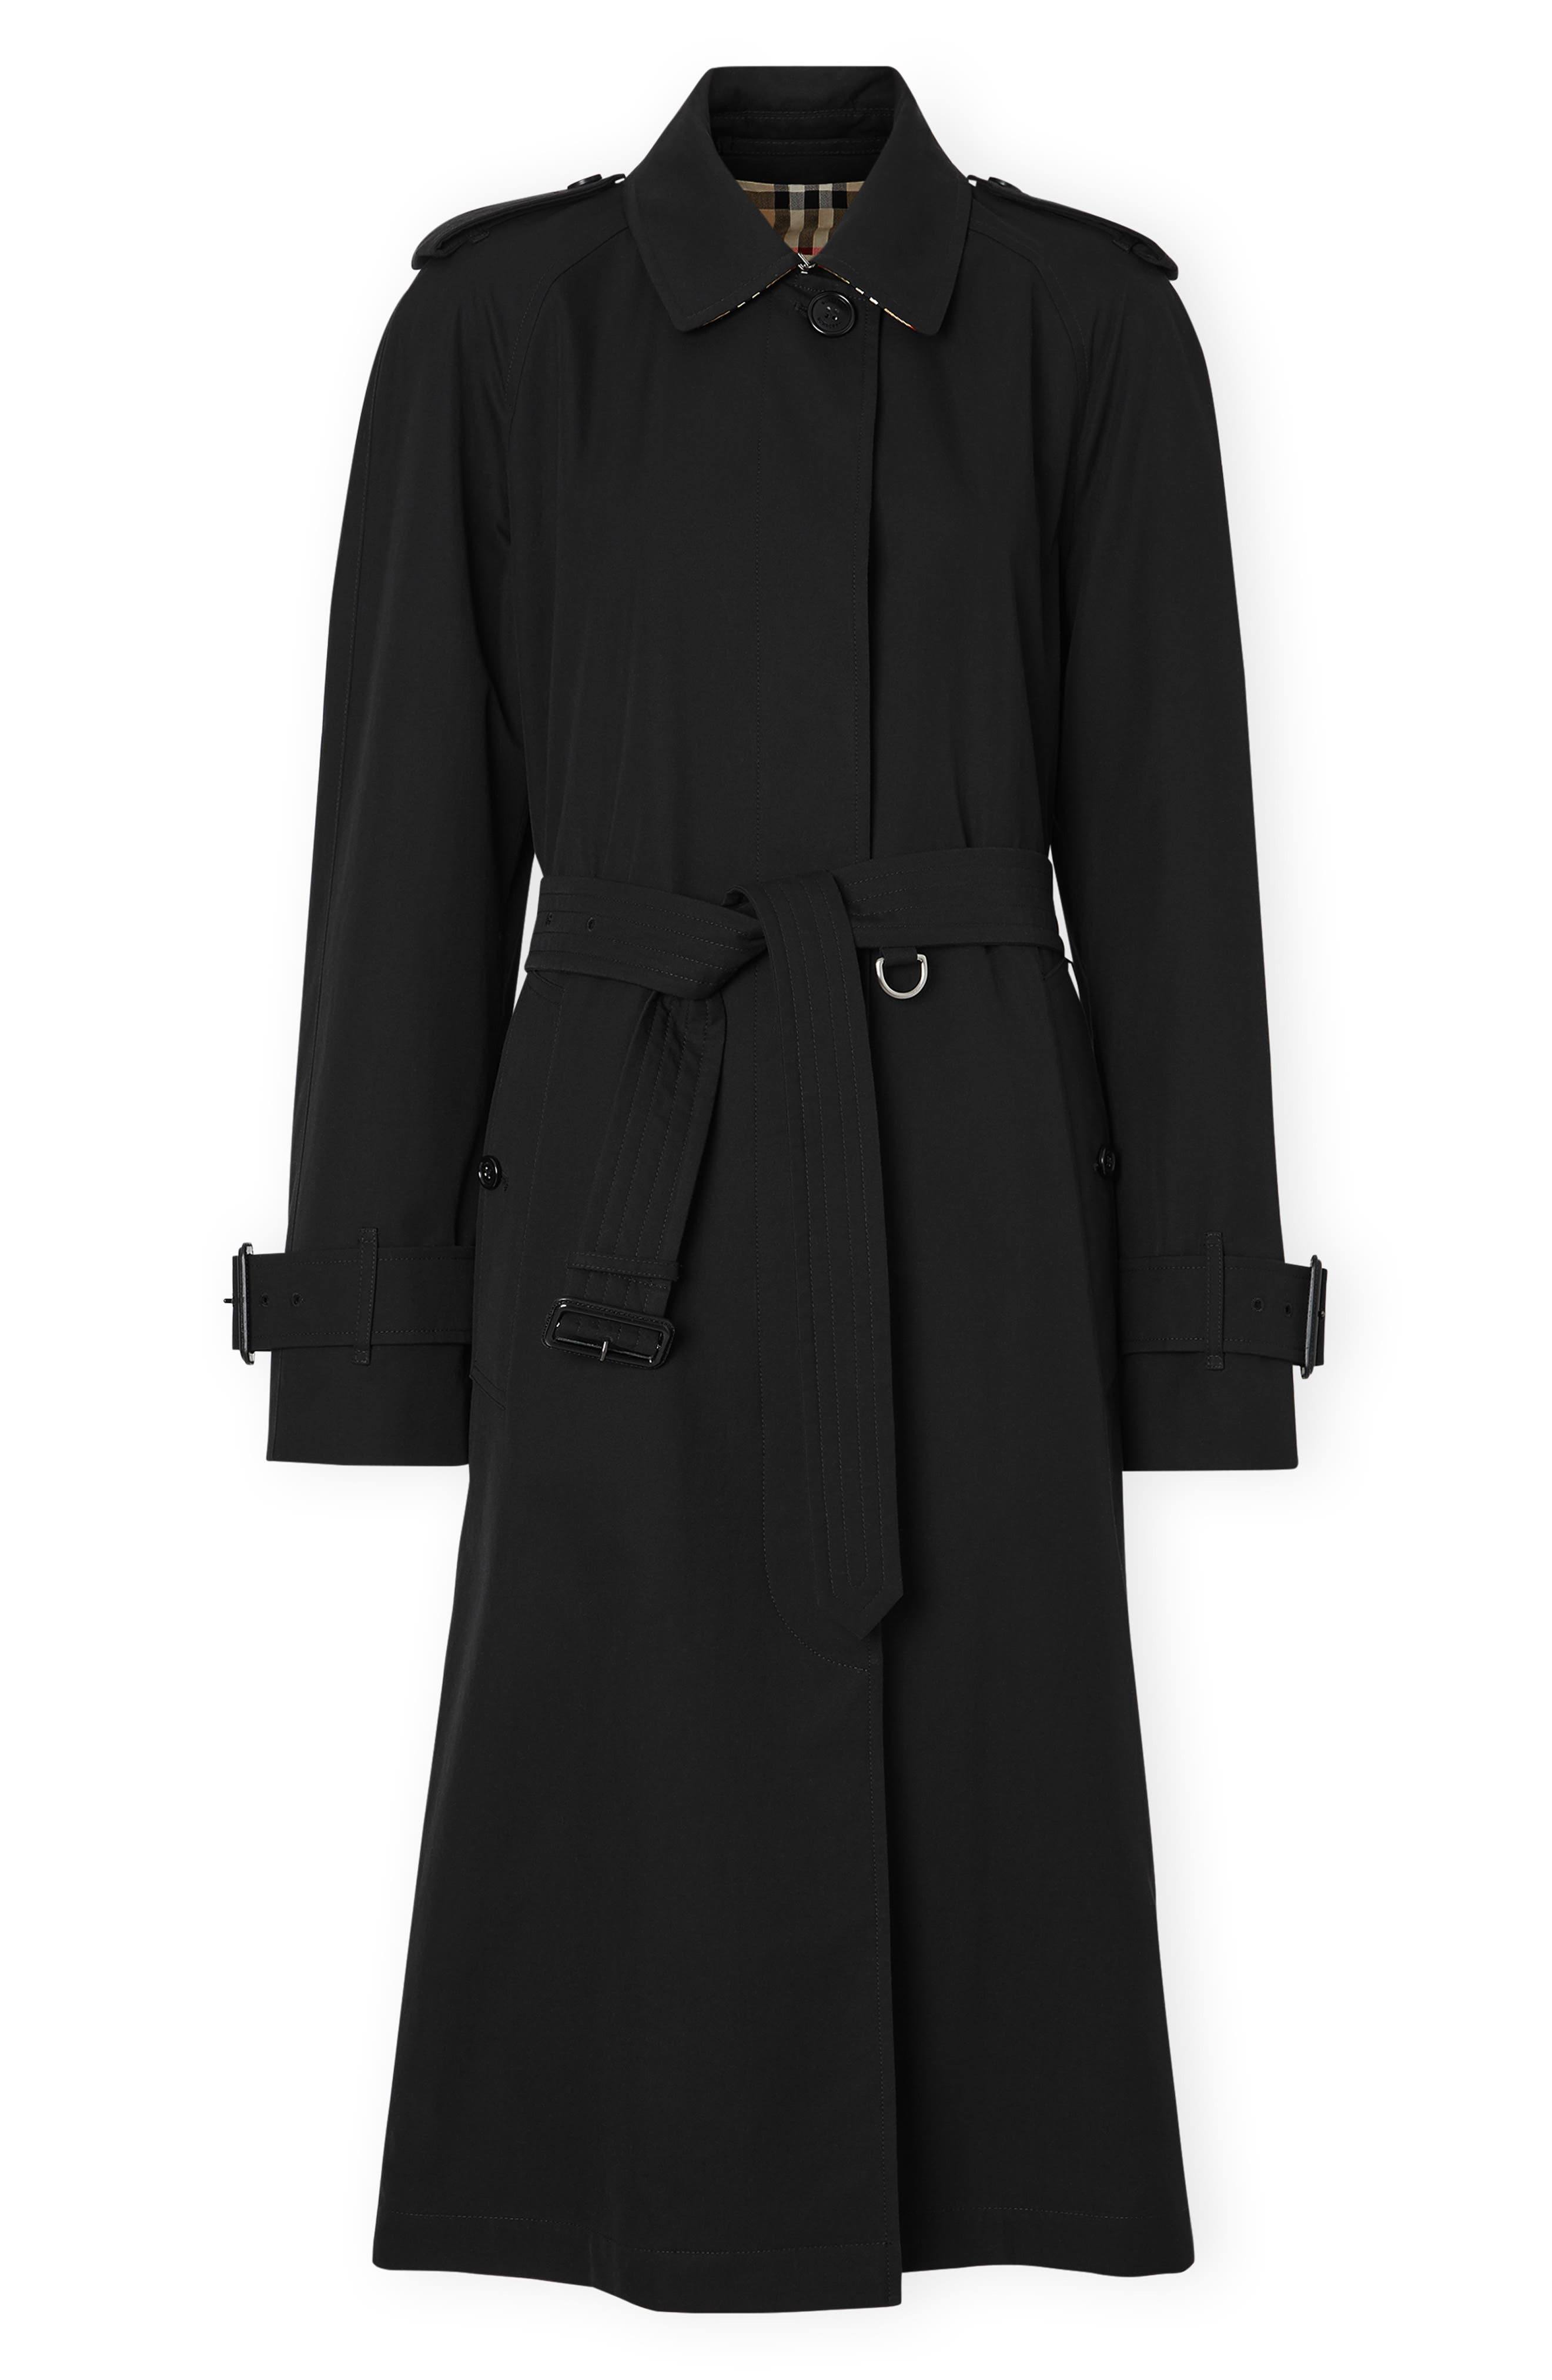 BURBERRY, Crostwick Side Slit Tropical Gabardine Trench Coat, Alternate thumbnail 5, color, BLACK